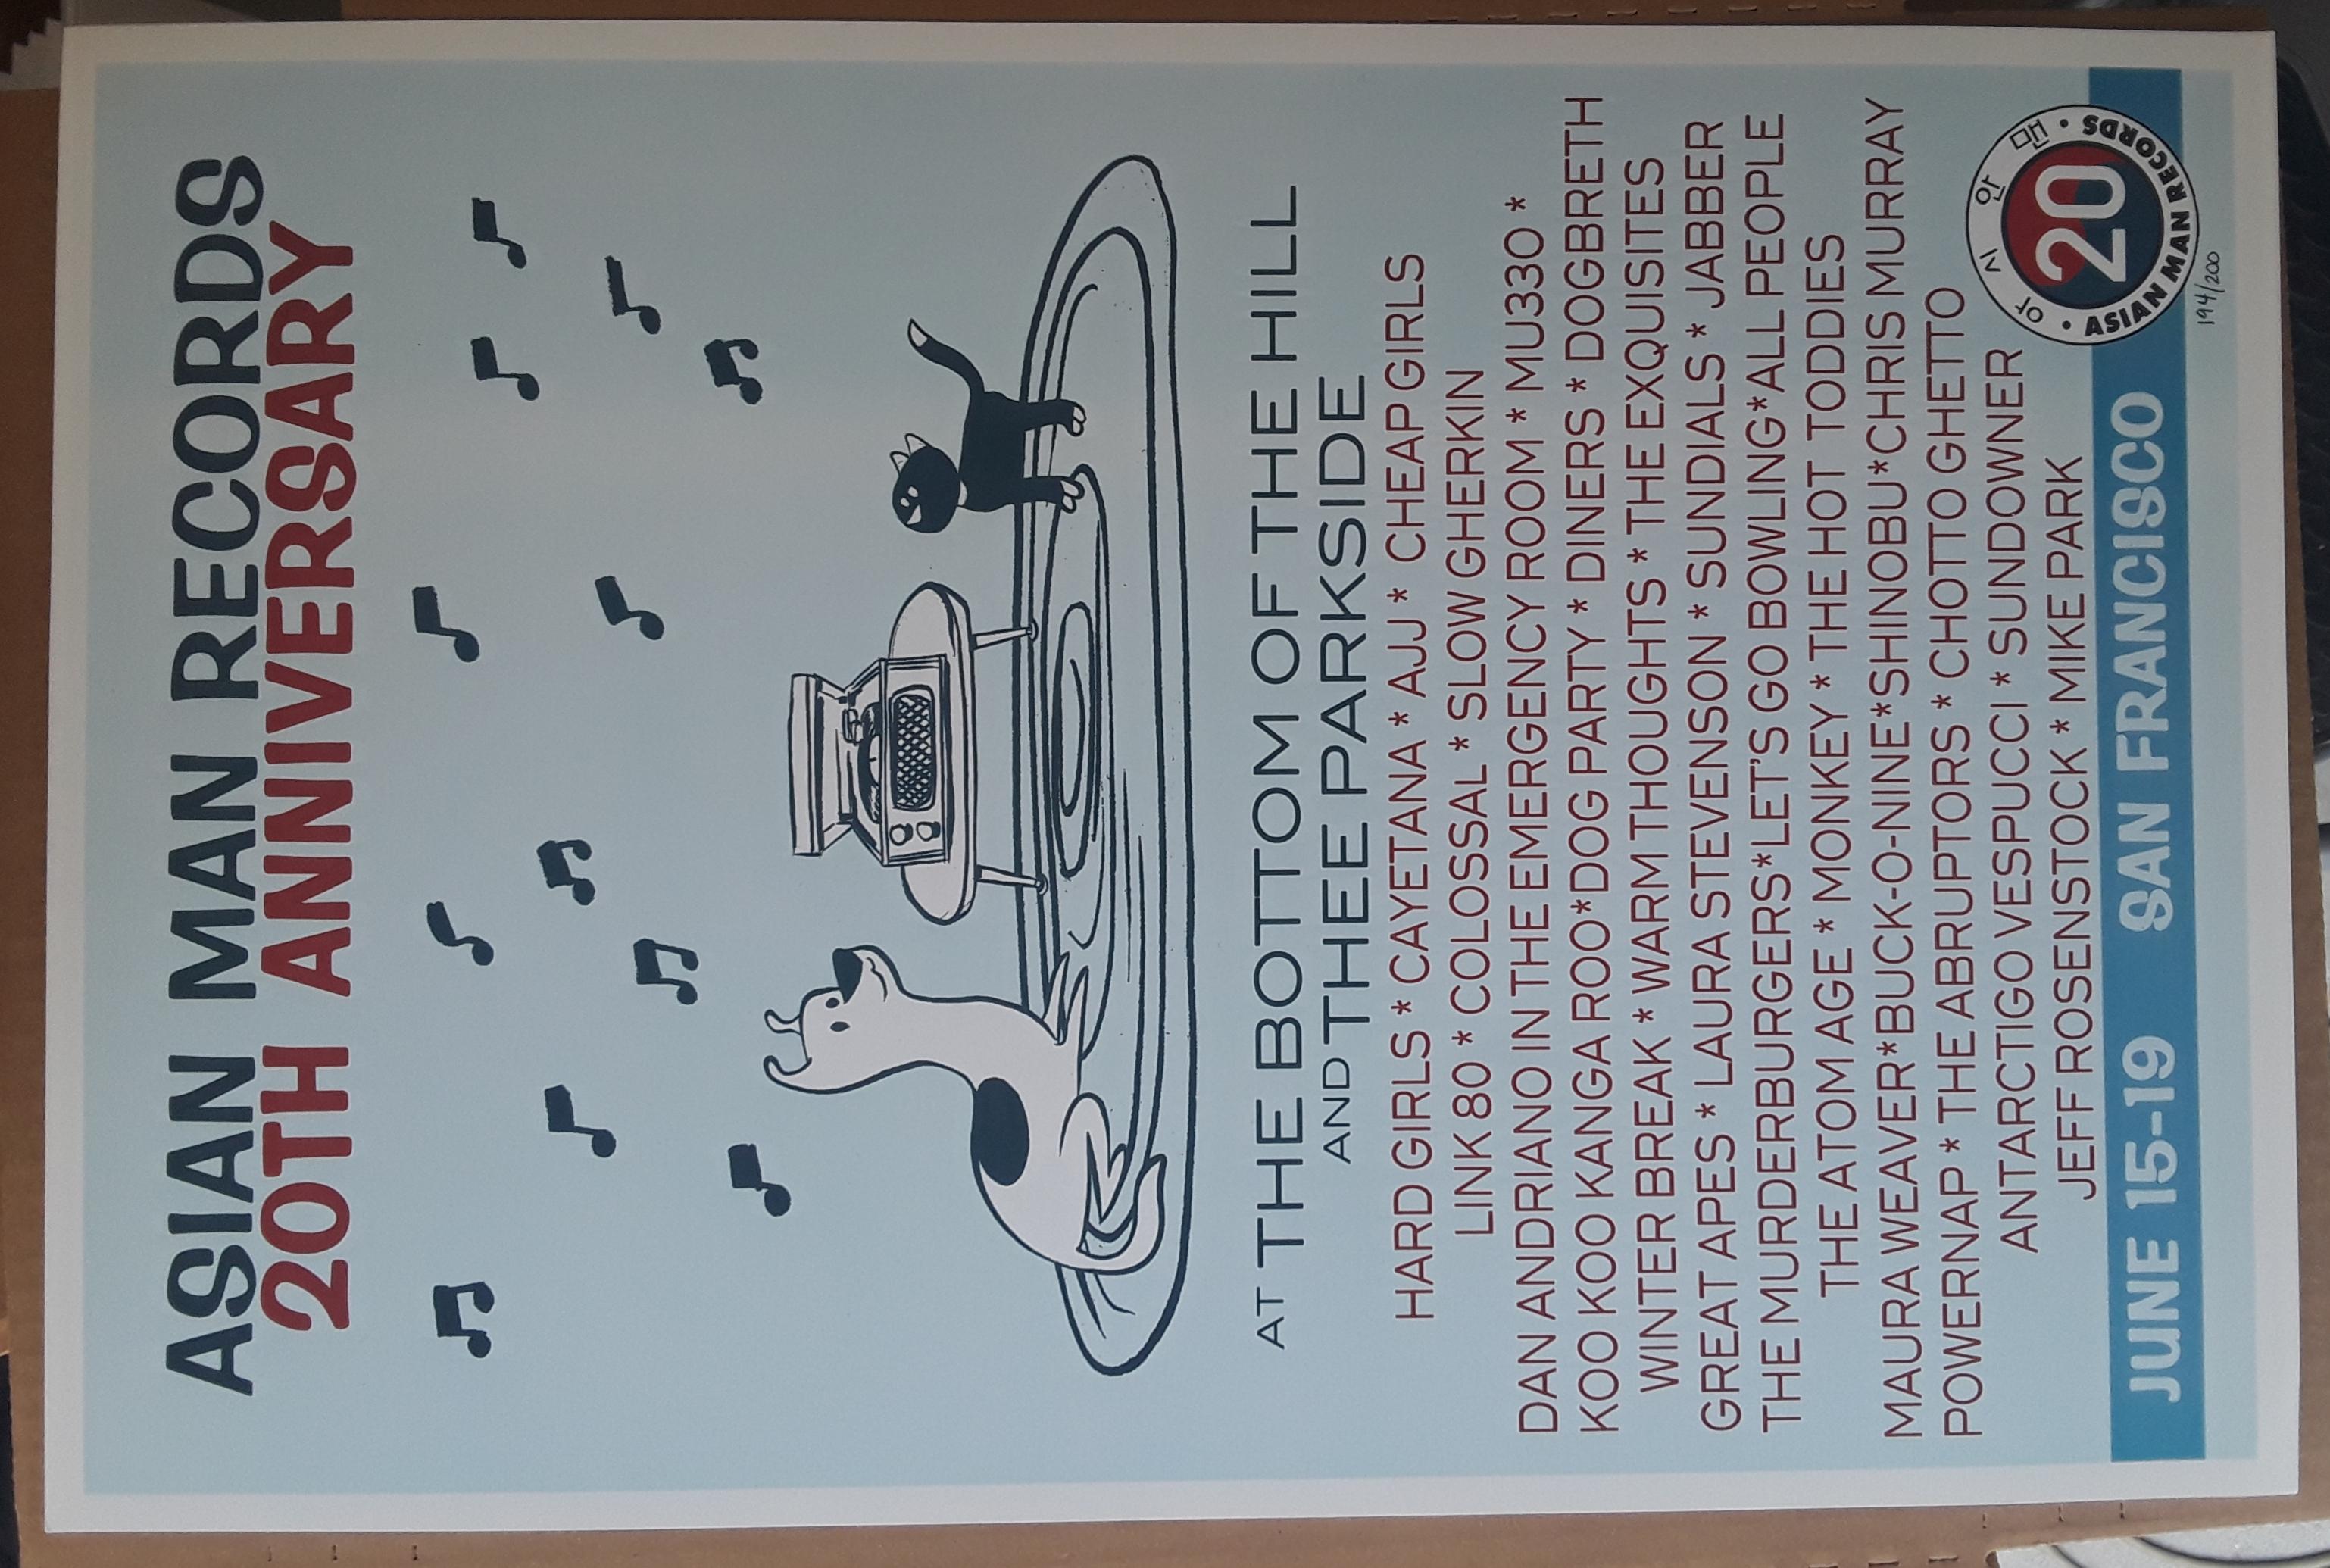 AMR 20 YR ANNIVERSARY poster